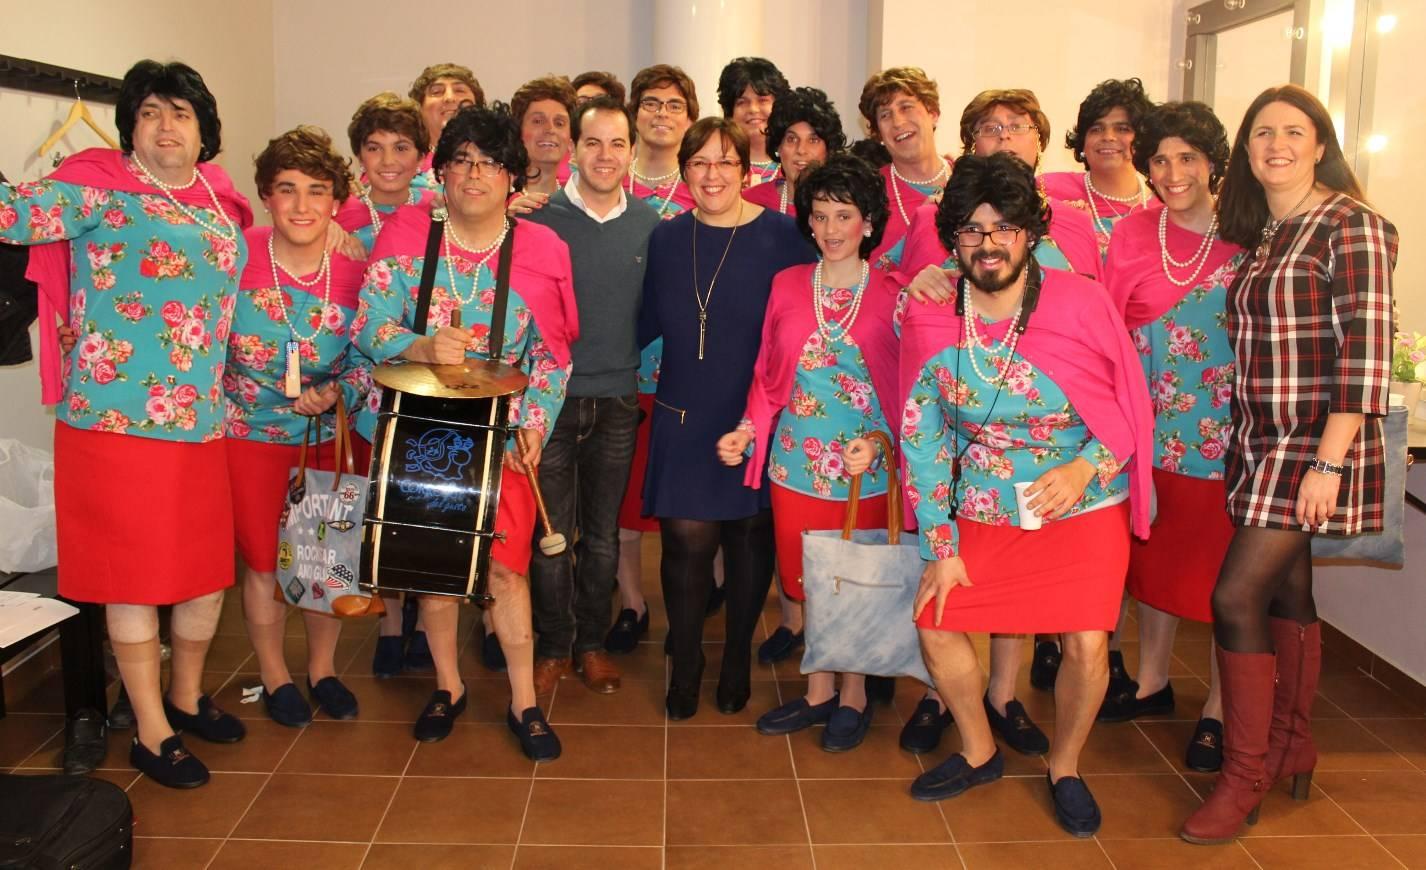 Carmen Olmedo - Carnaval de Herencia (Pelendengues) 1